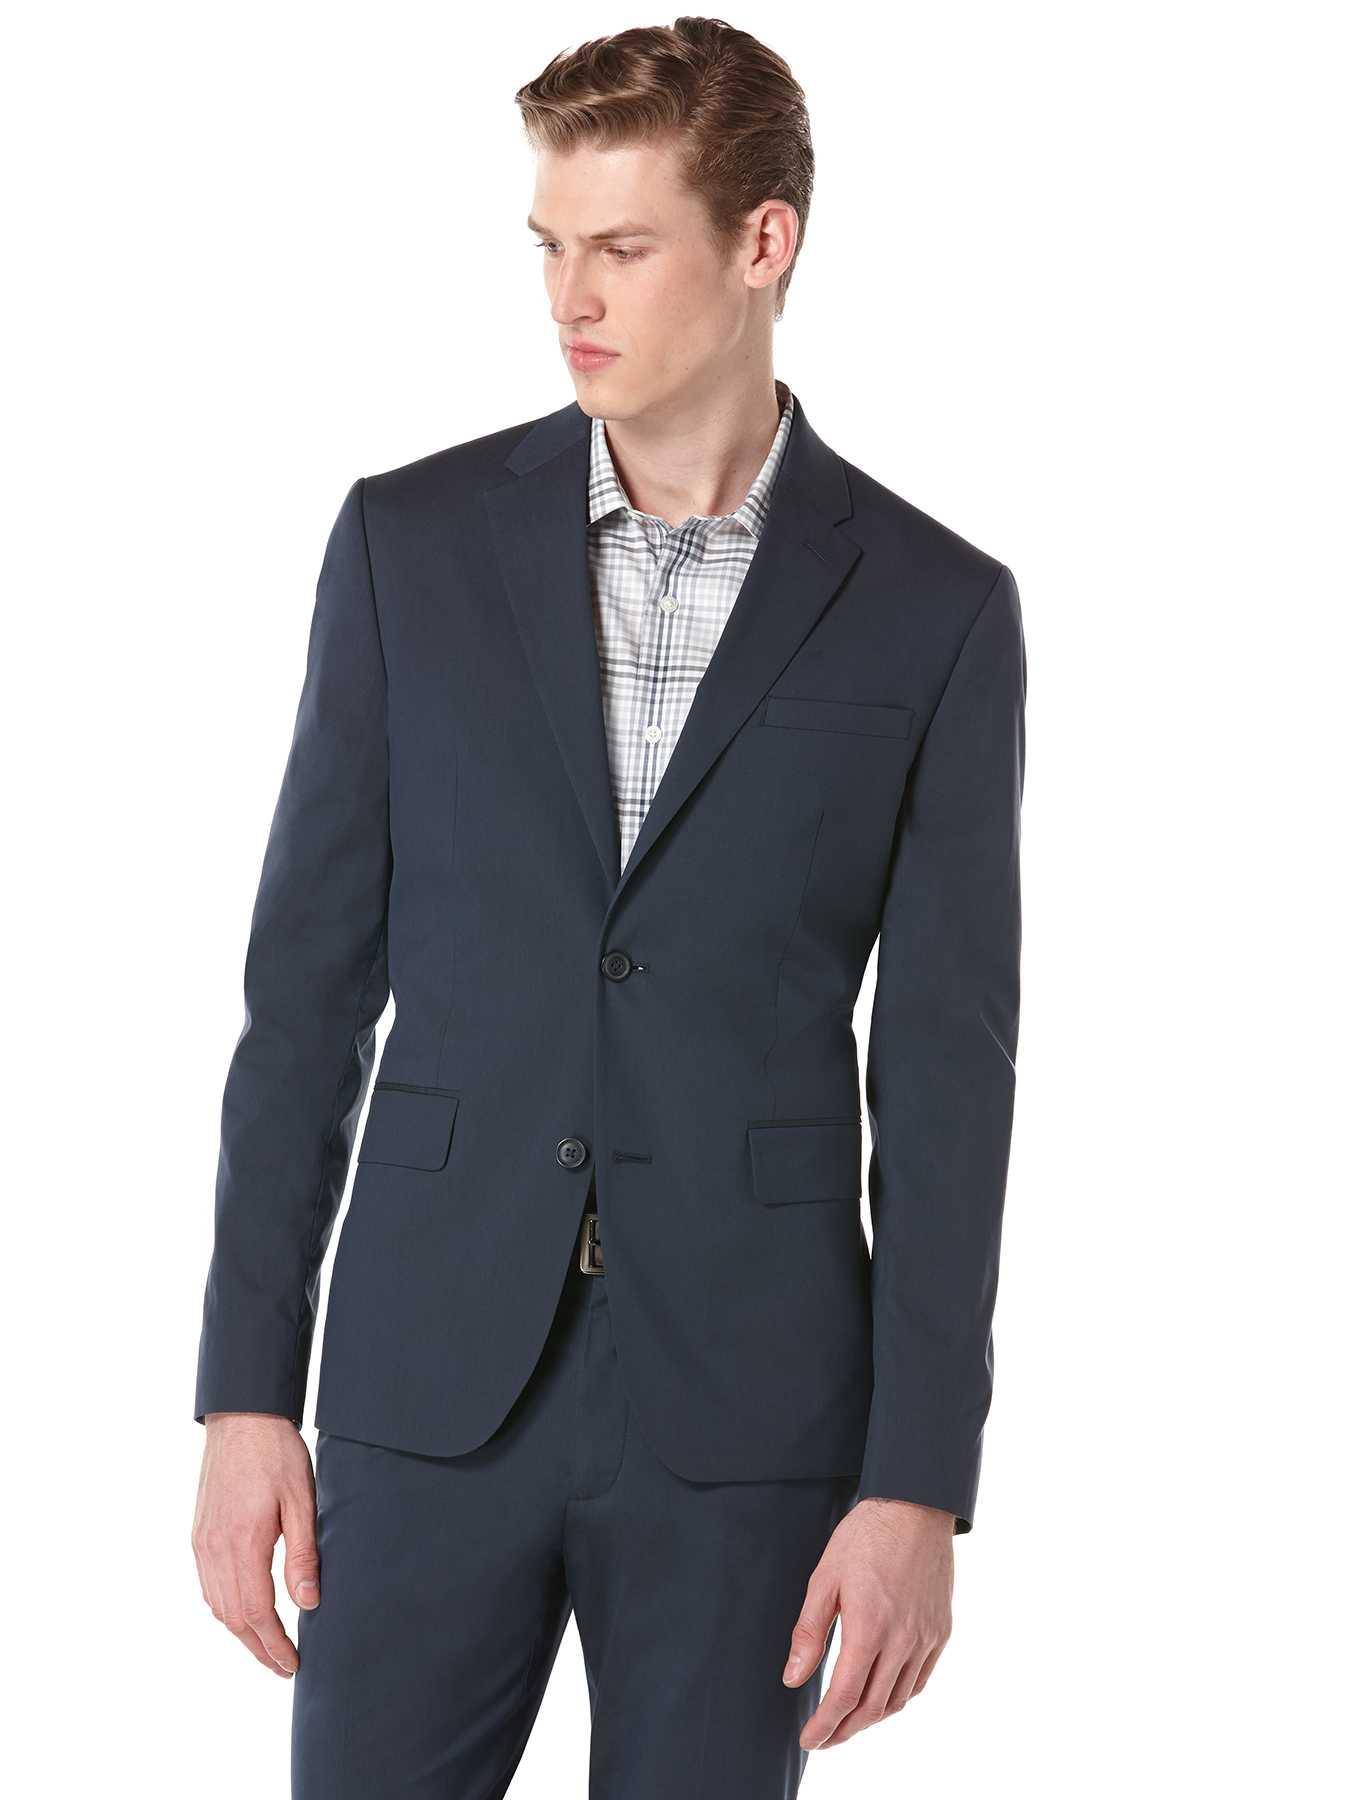 Perry Ellis Very Slim Iridescent Suit Jacket